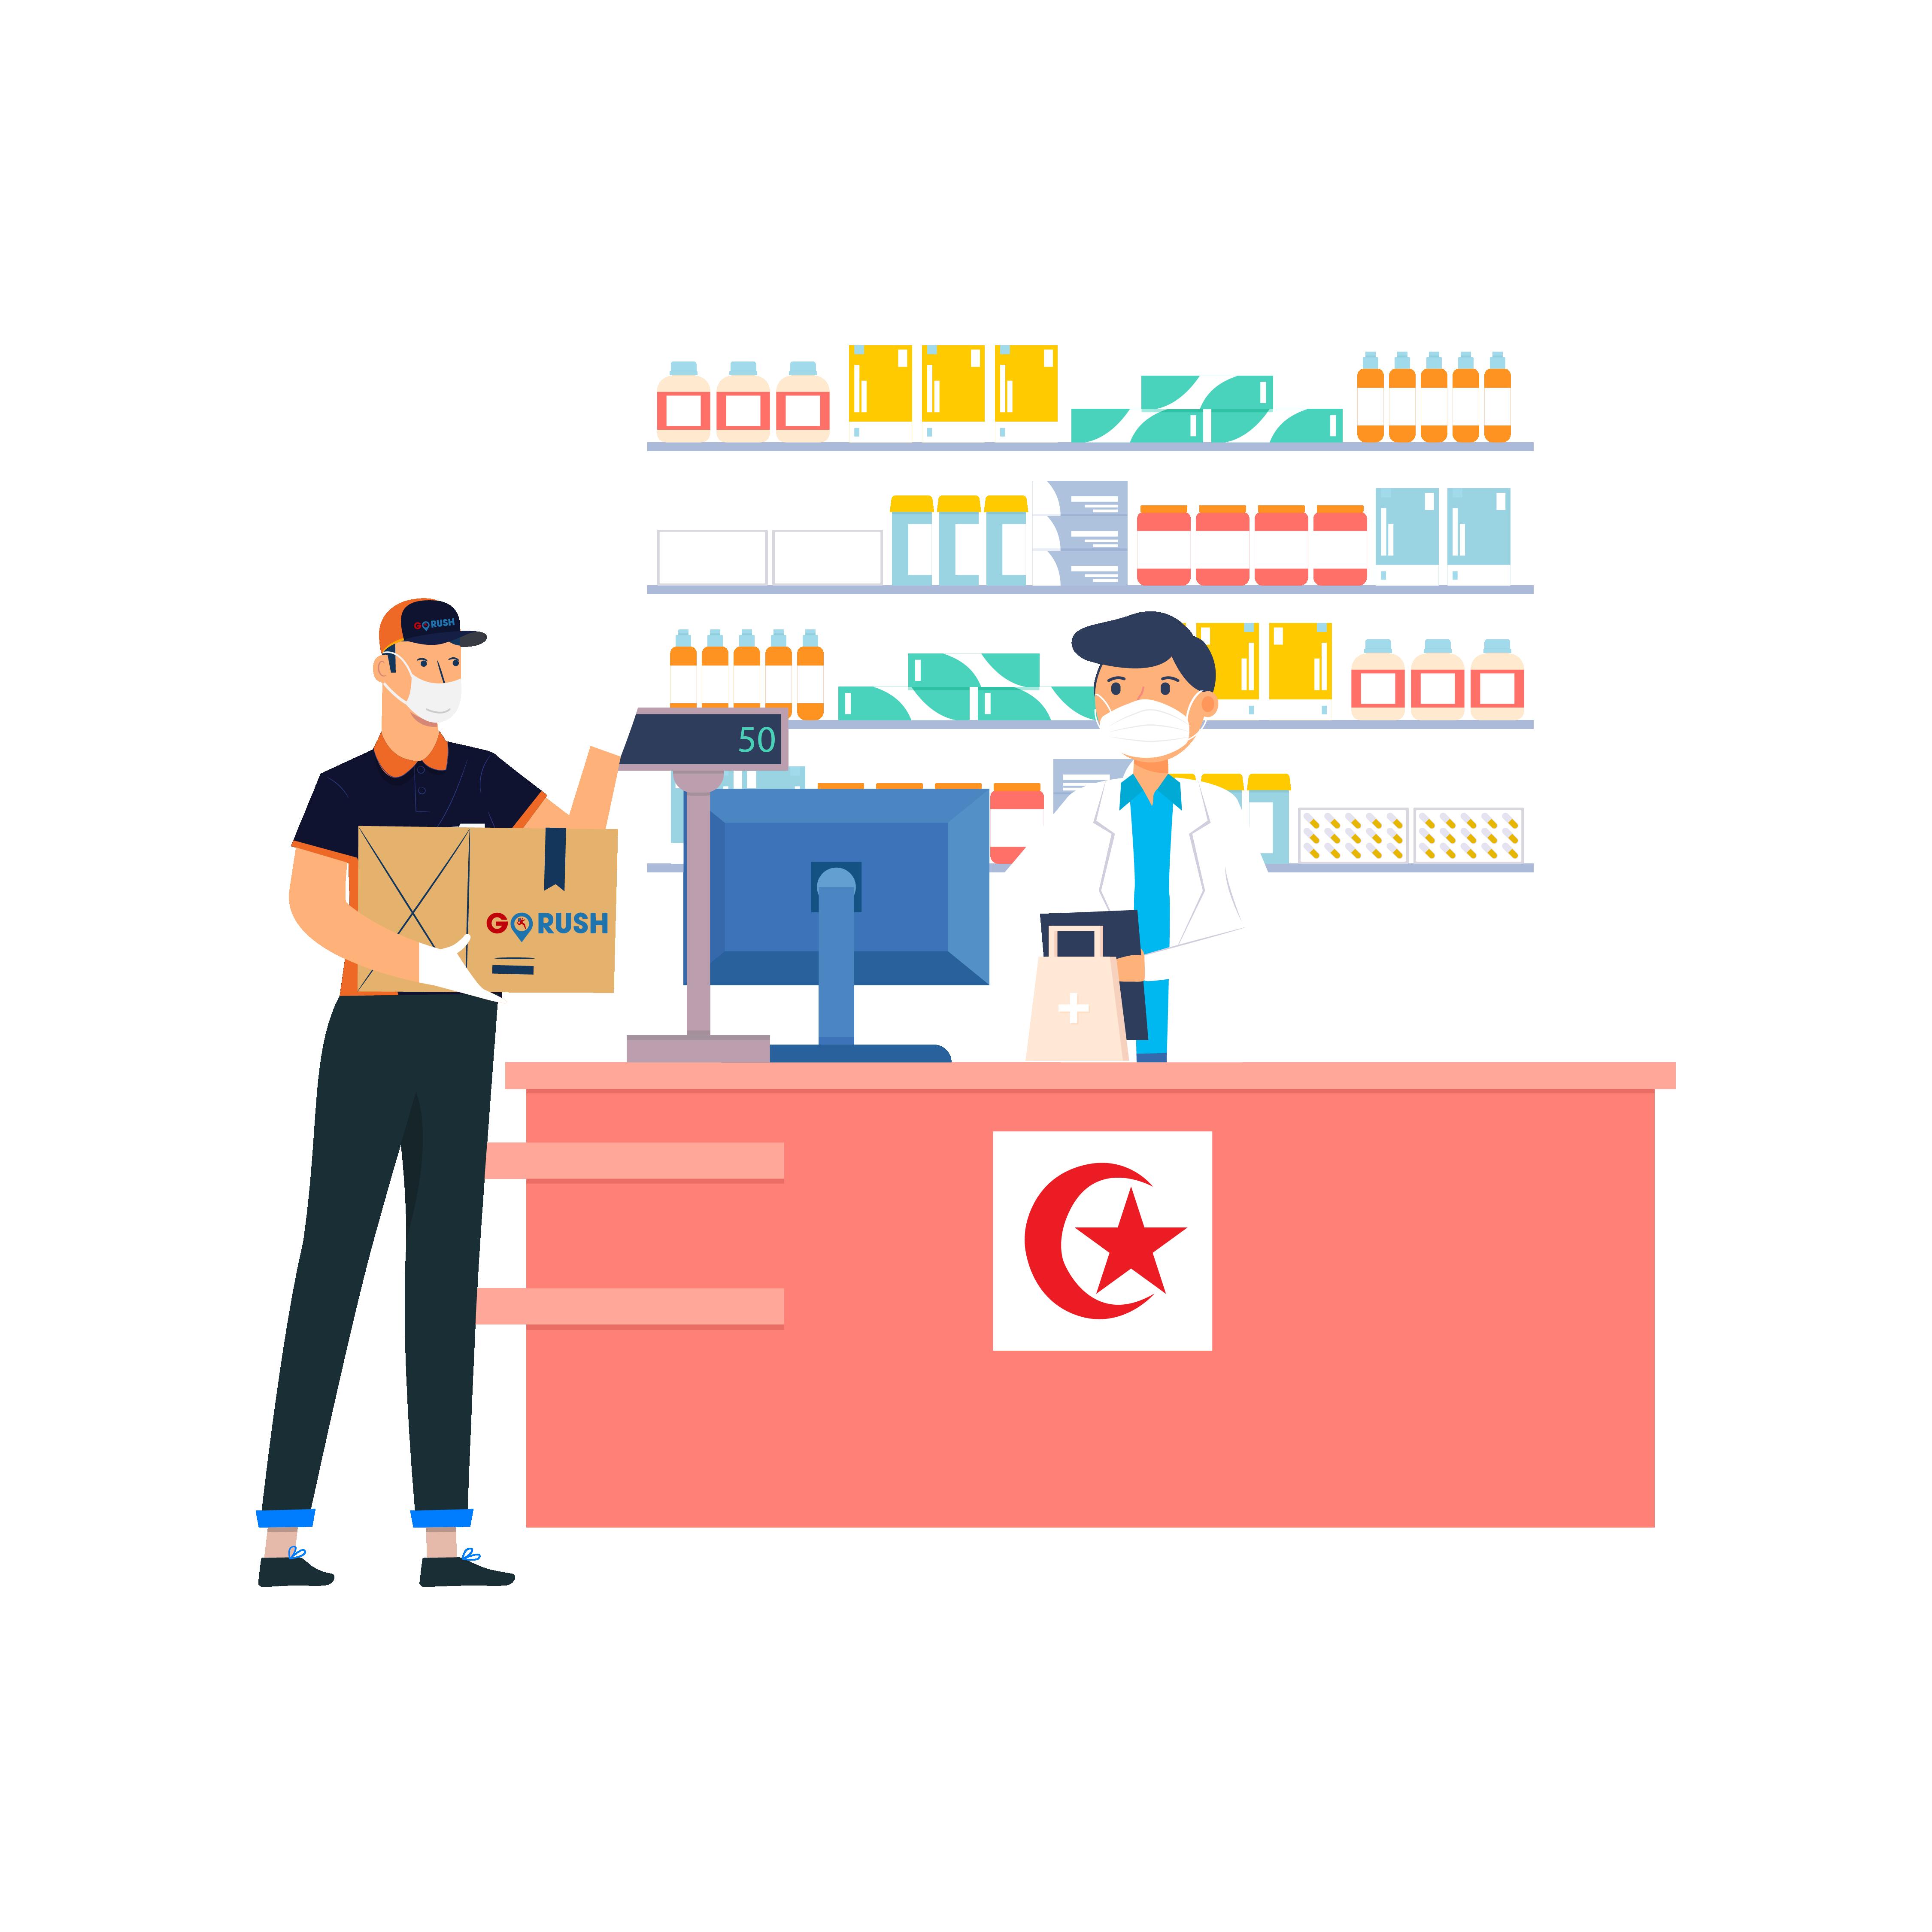 gorush-pharmacy delivery